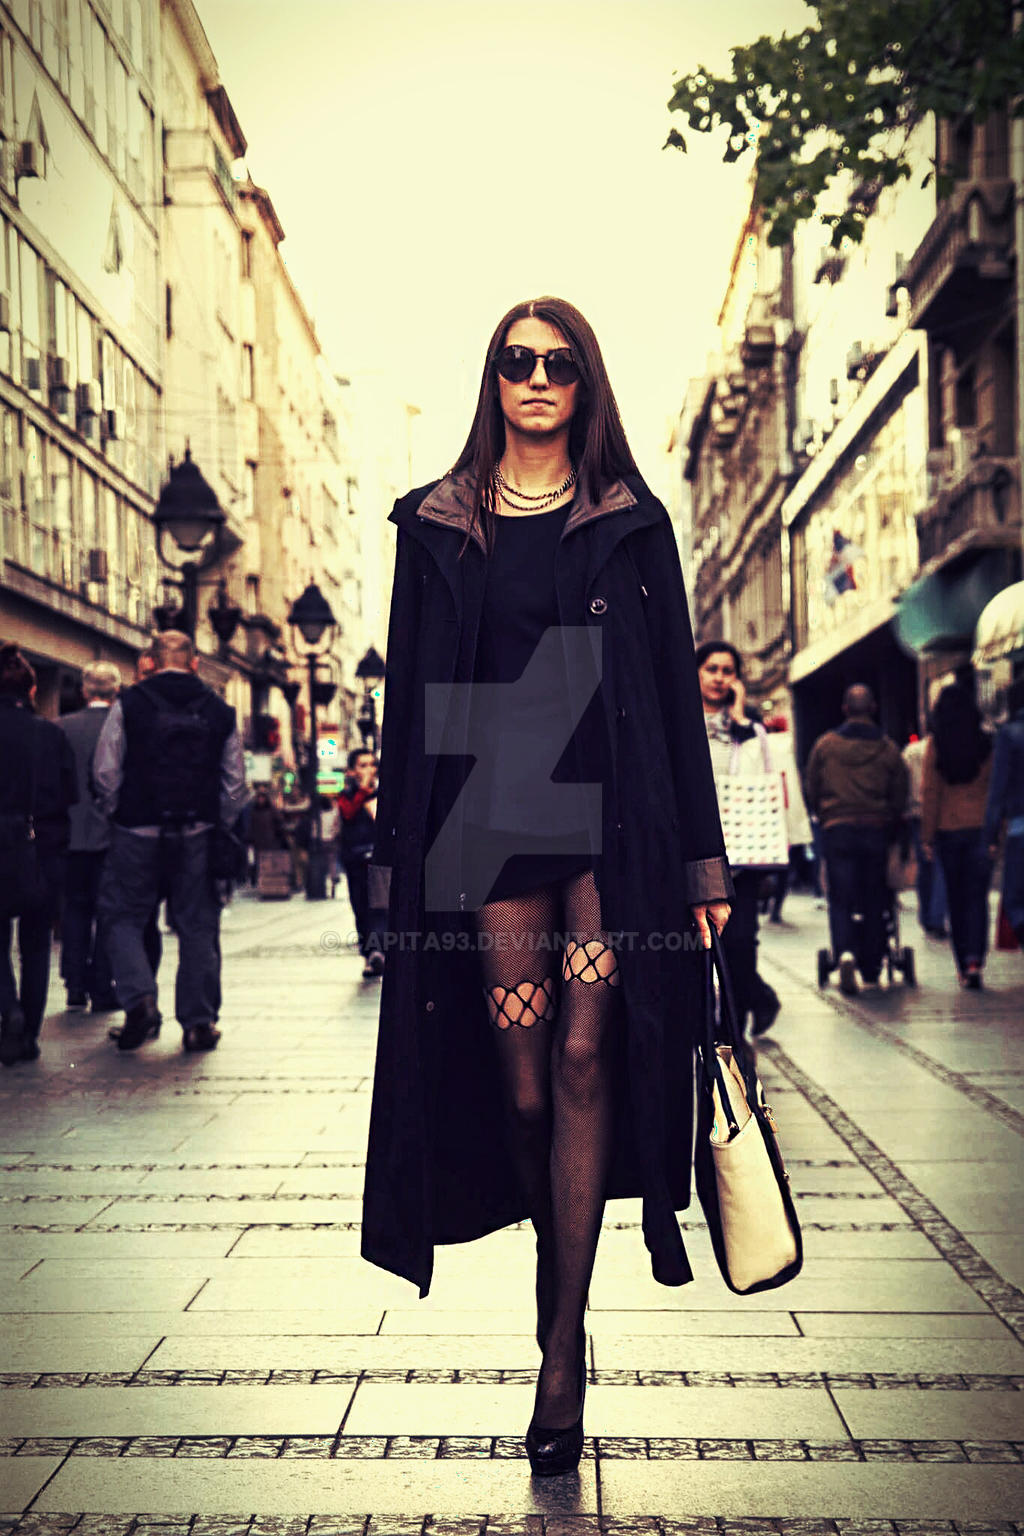 Matrix girl by capita93